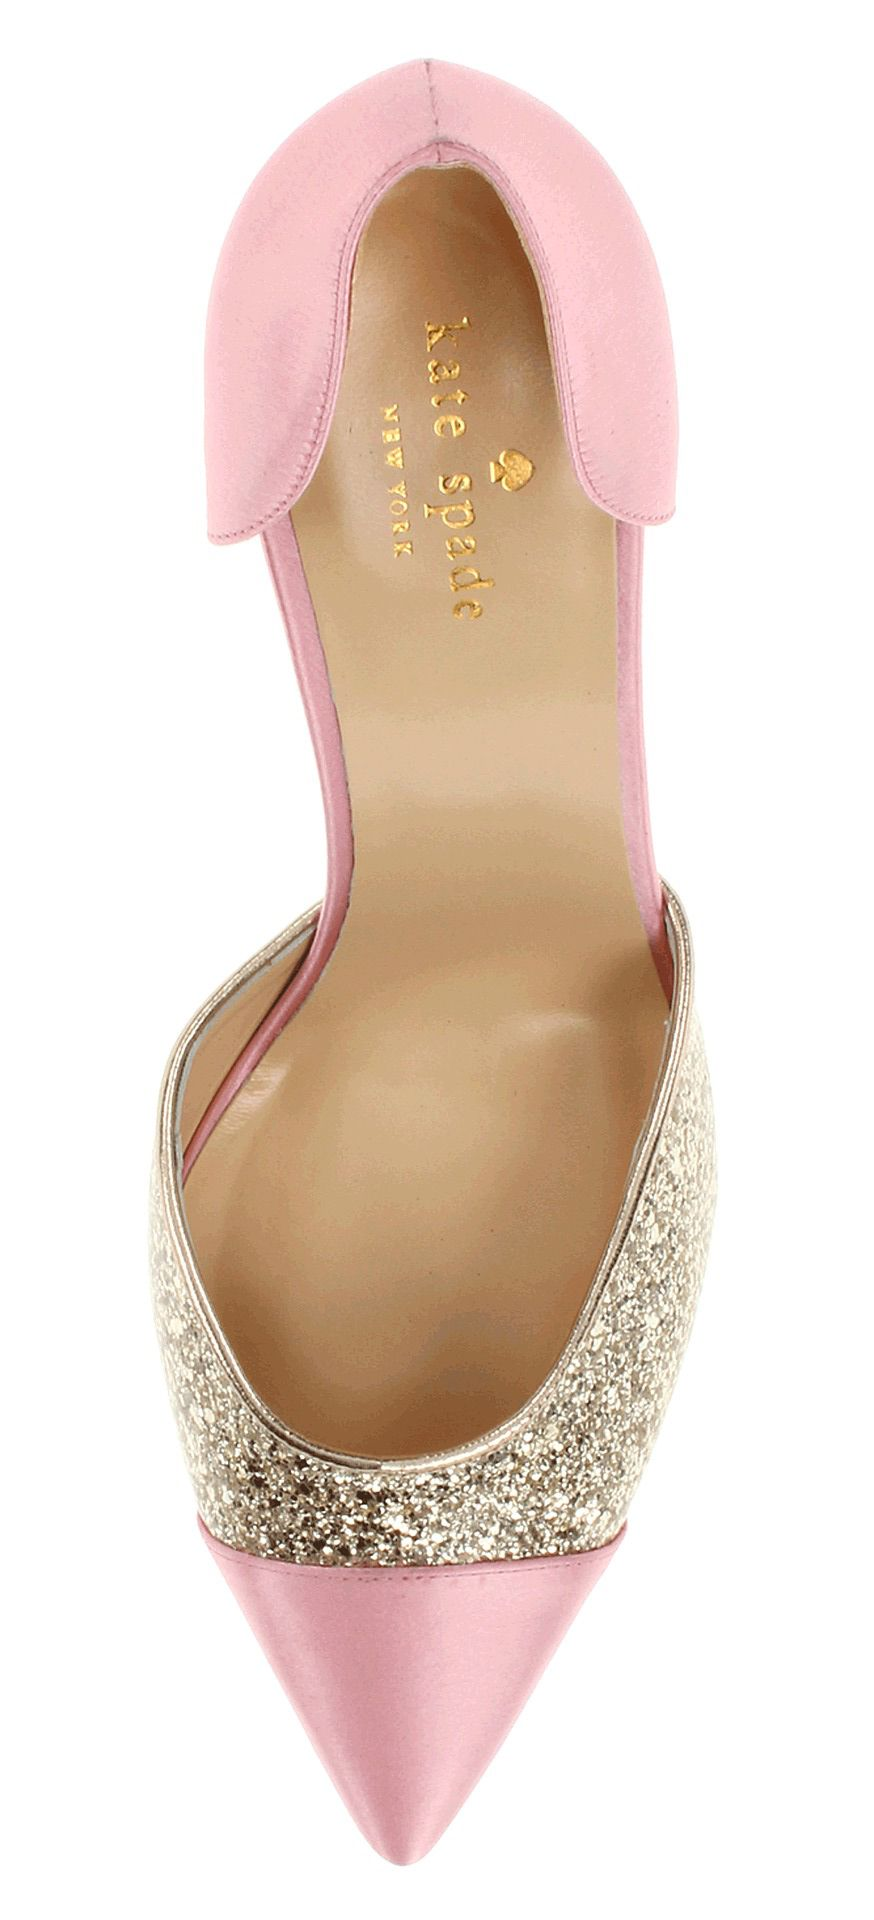 gold pumps:: Pink heels:: Sparkly